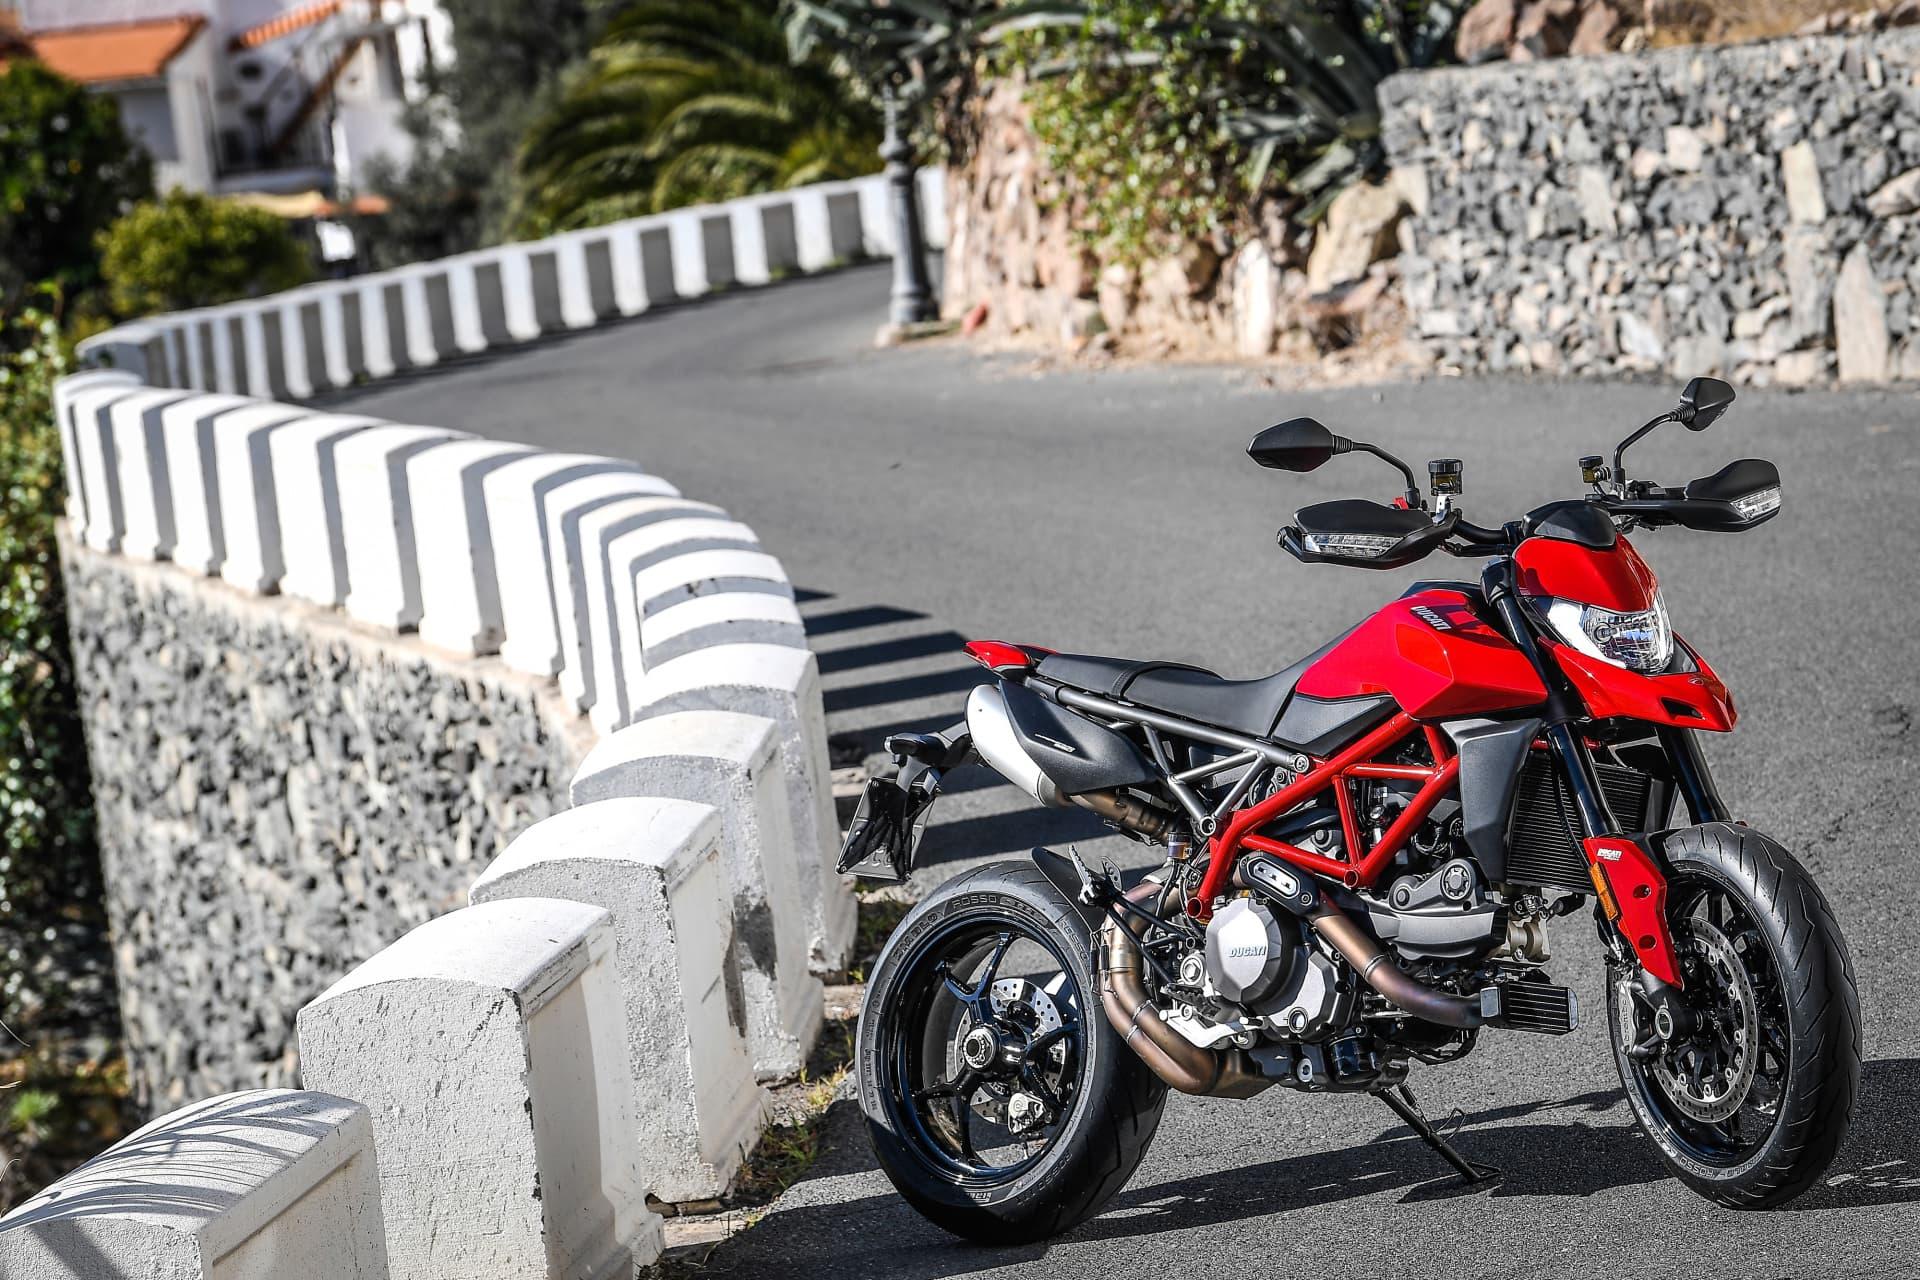 Ducati Hypermotard 950 Static 11 Uc70271 Mid